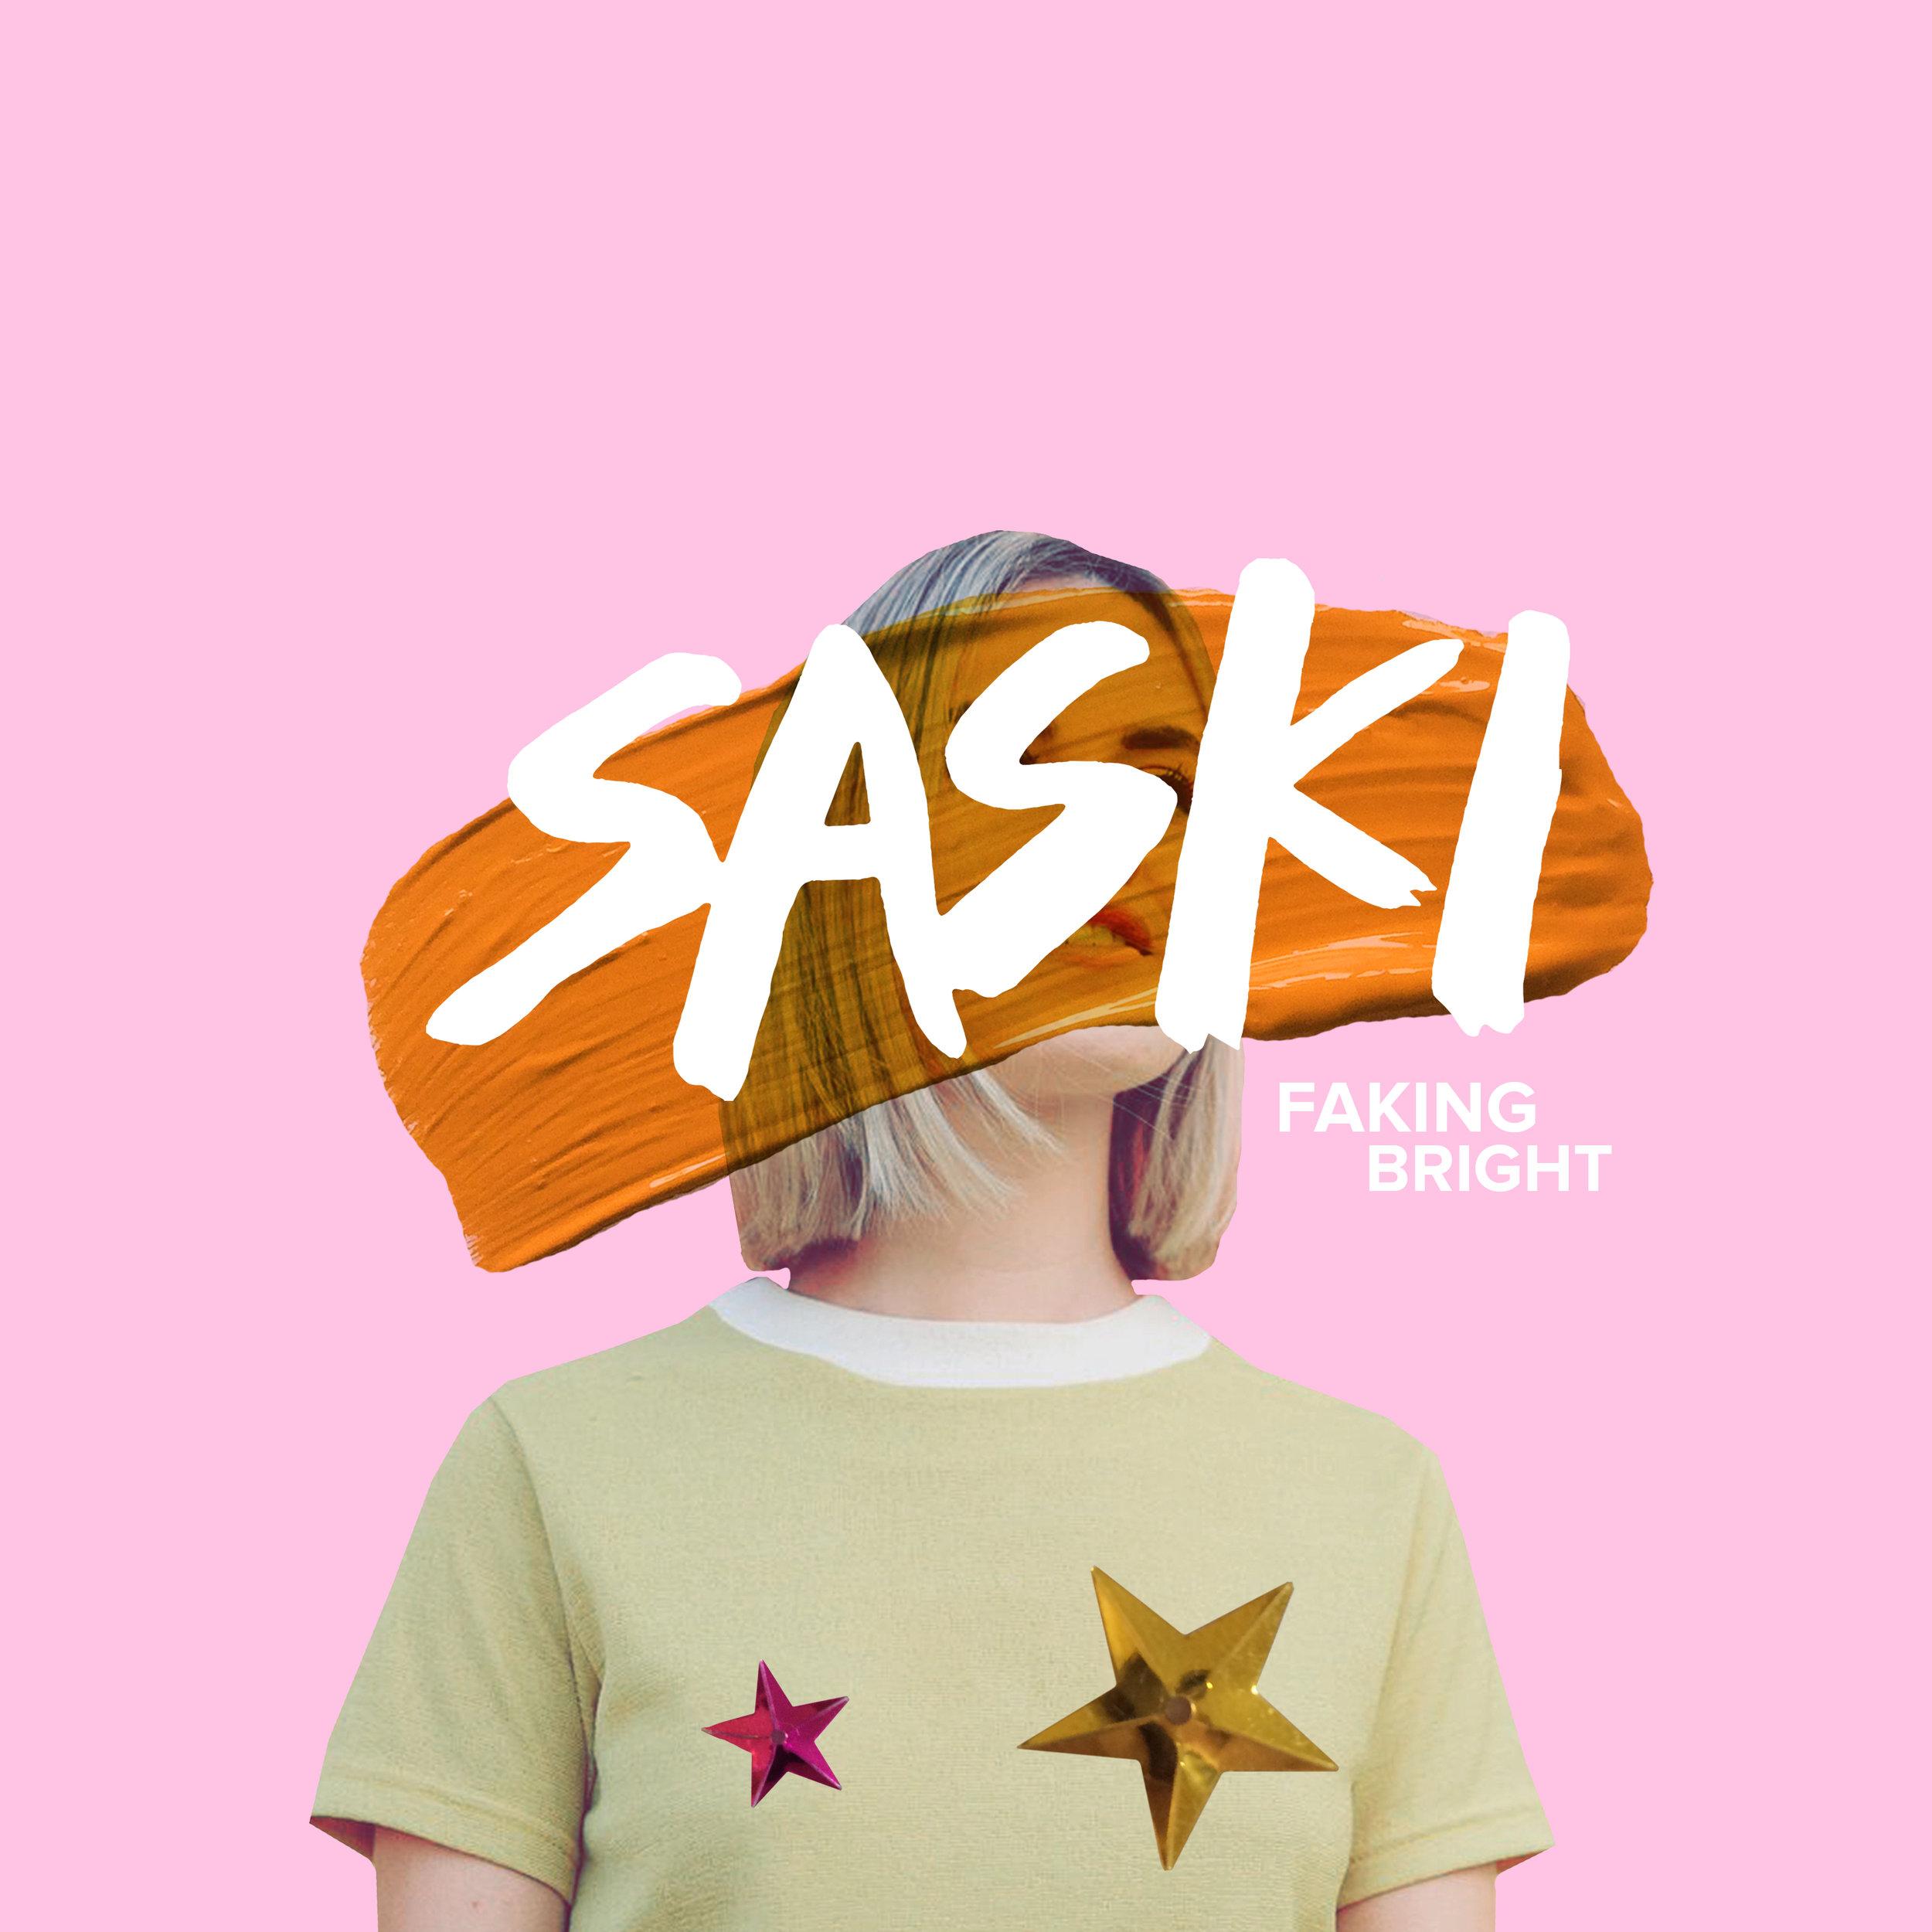 SASKI_FakingBright_COVER.jpg